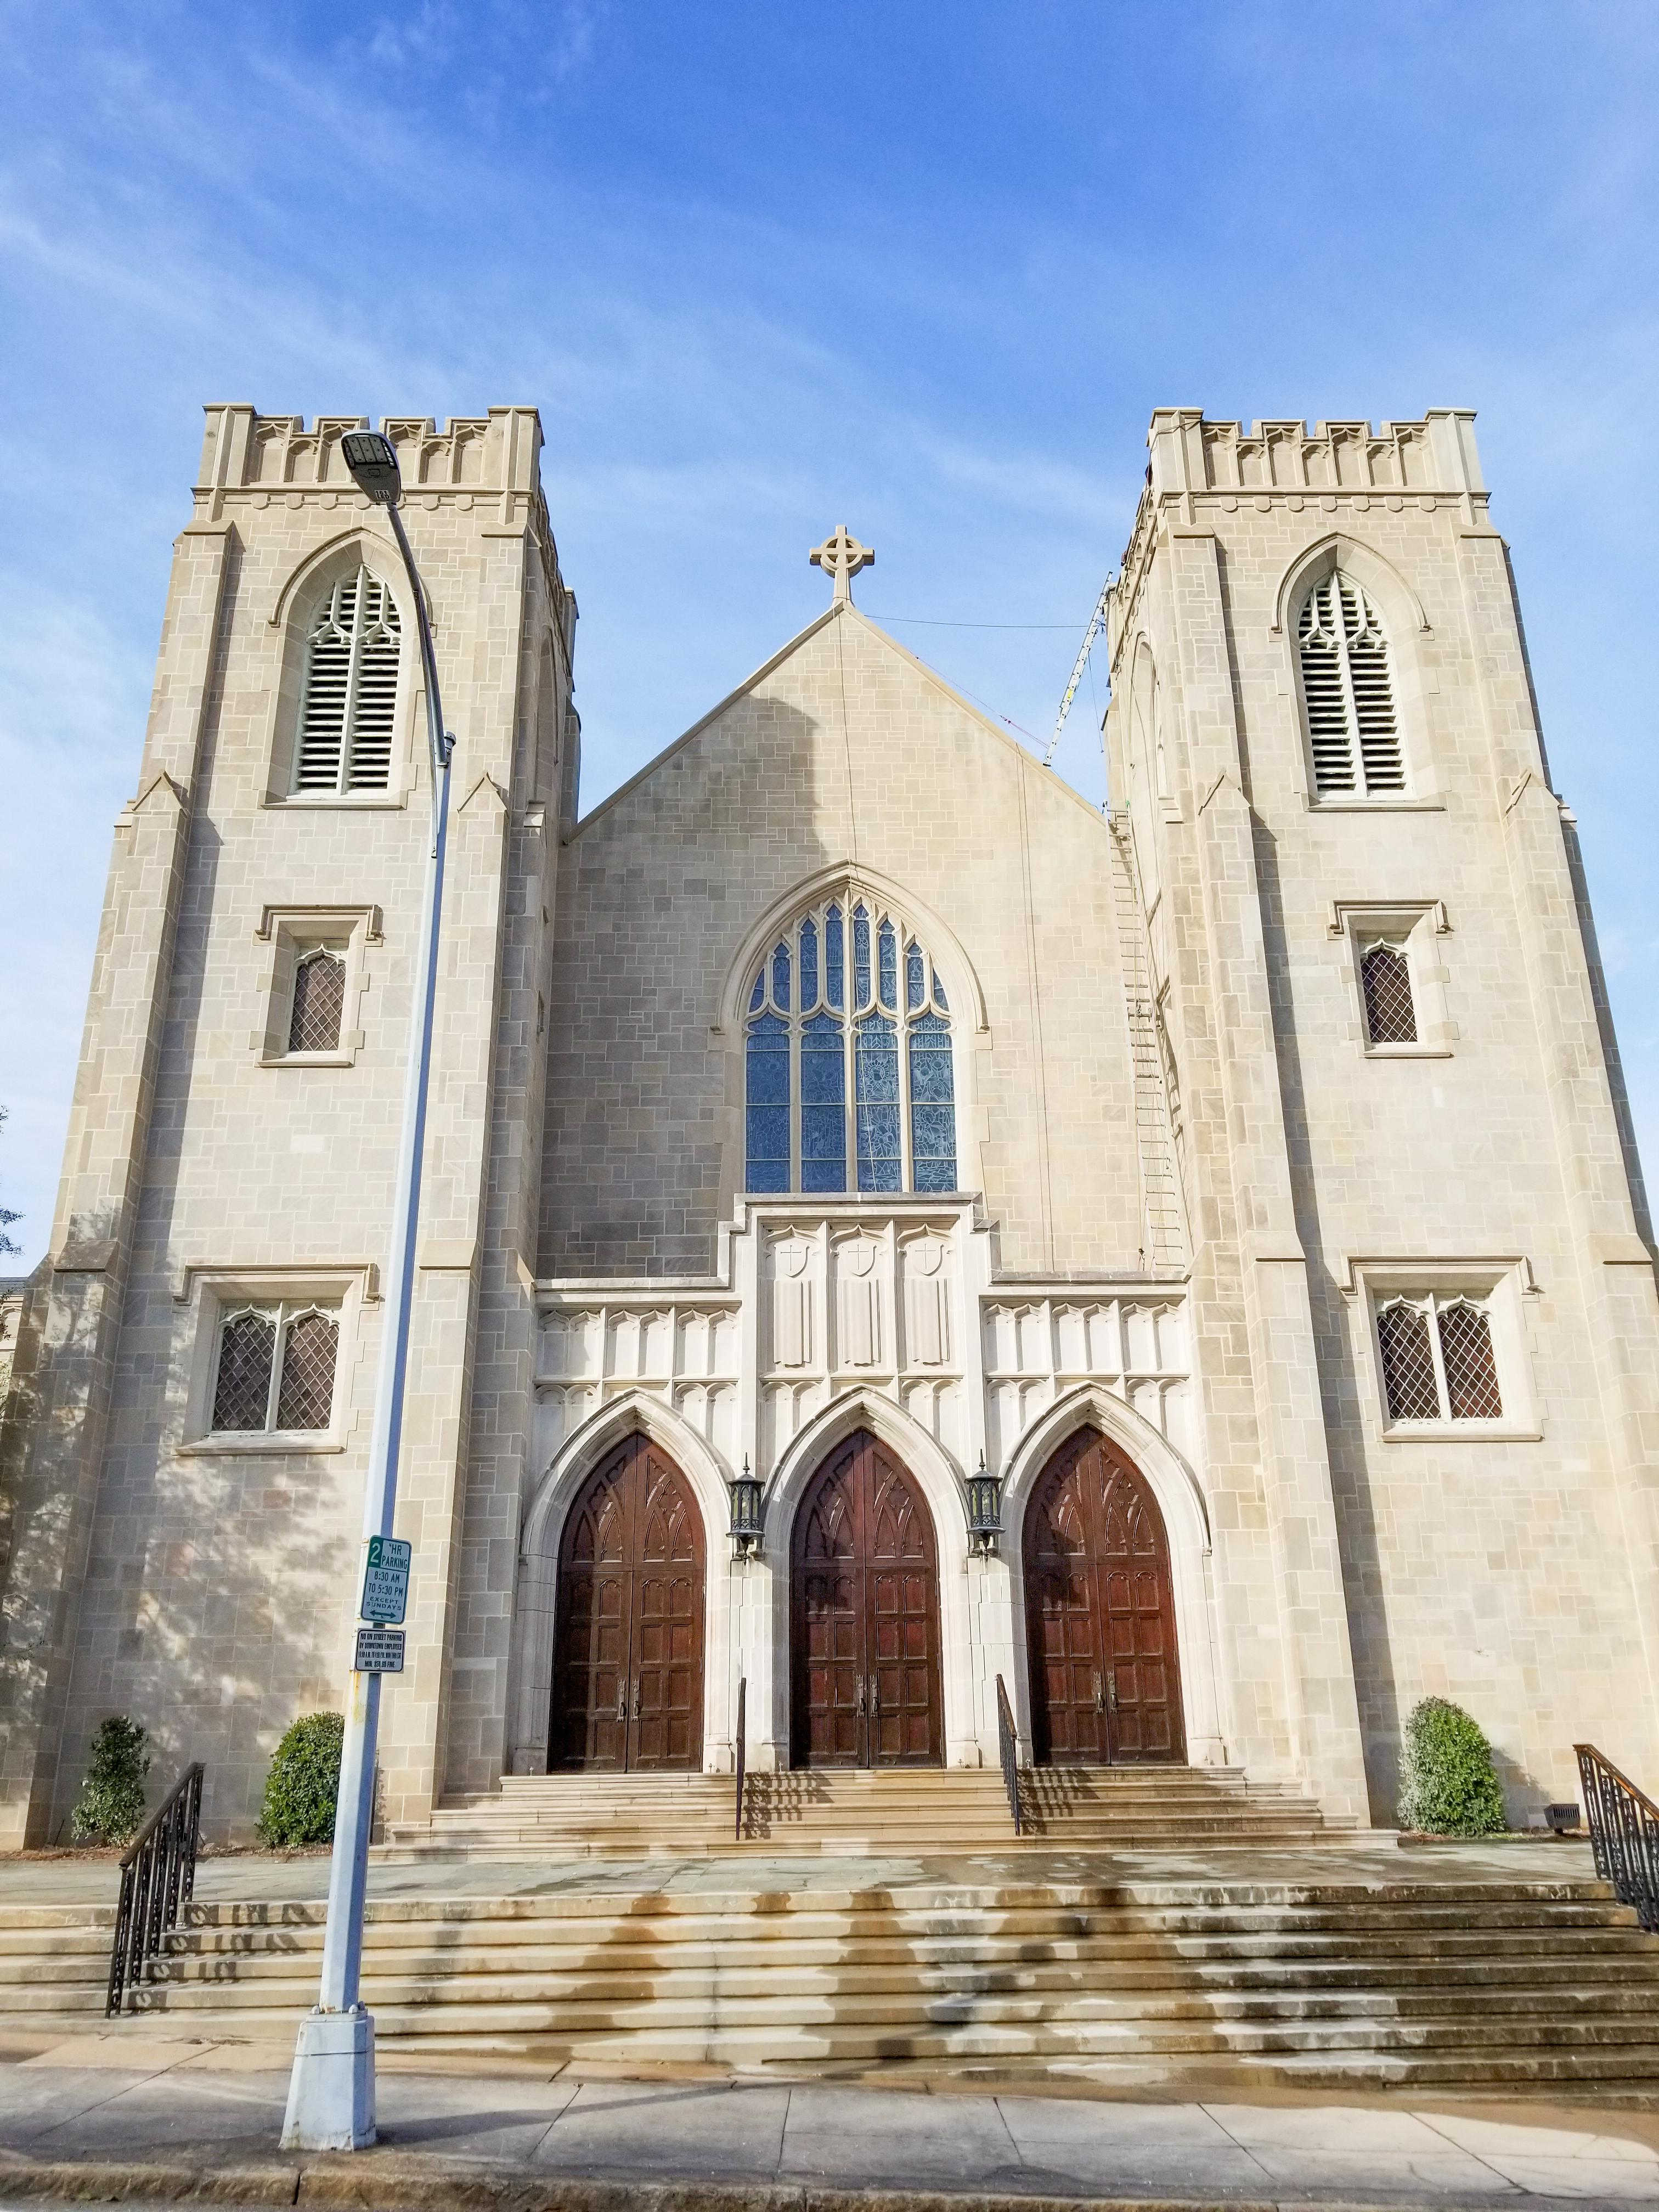 Mulberry Street United Methodist Church in Macon, Georgia